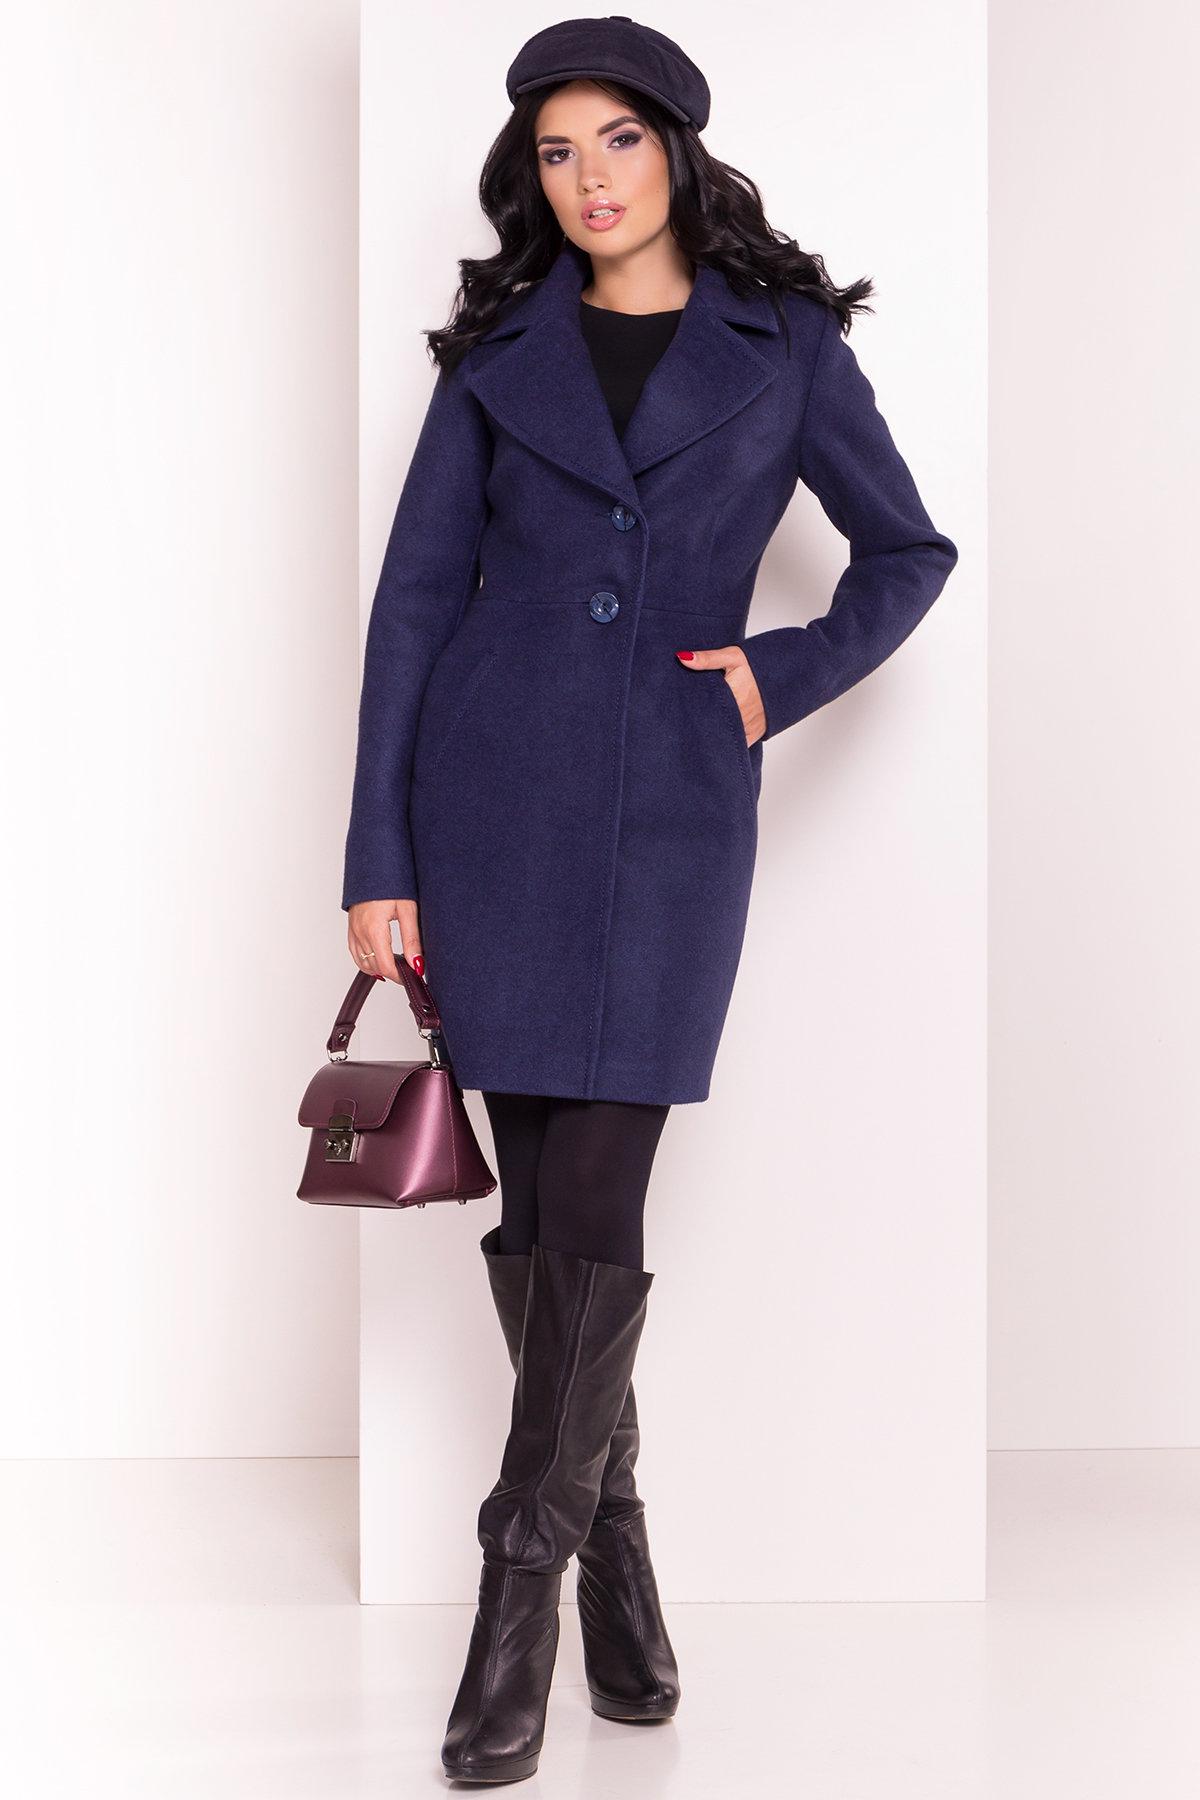 Пальто Камила 5373 АРТ. 36549 Цвет: Темно-синий 17 - фото 2, интернет магазин tm-modus.ru